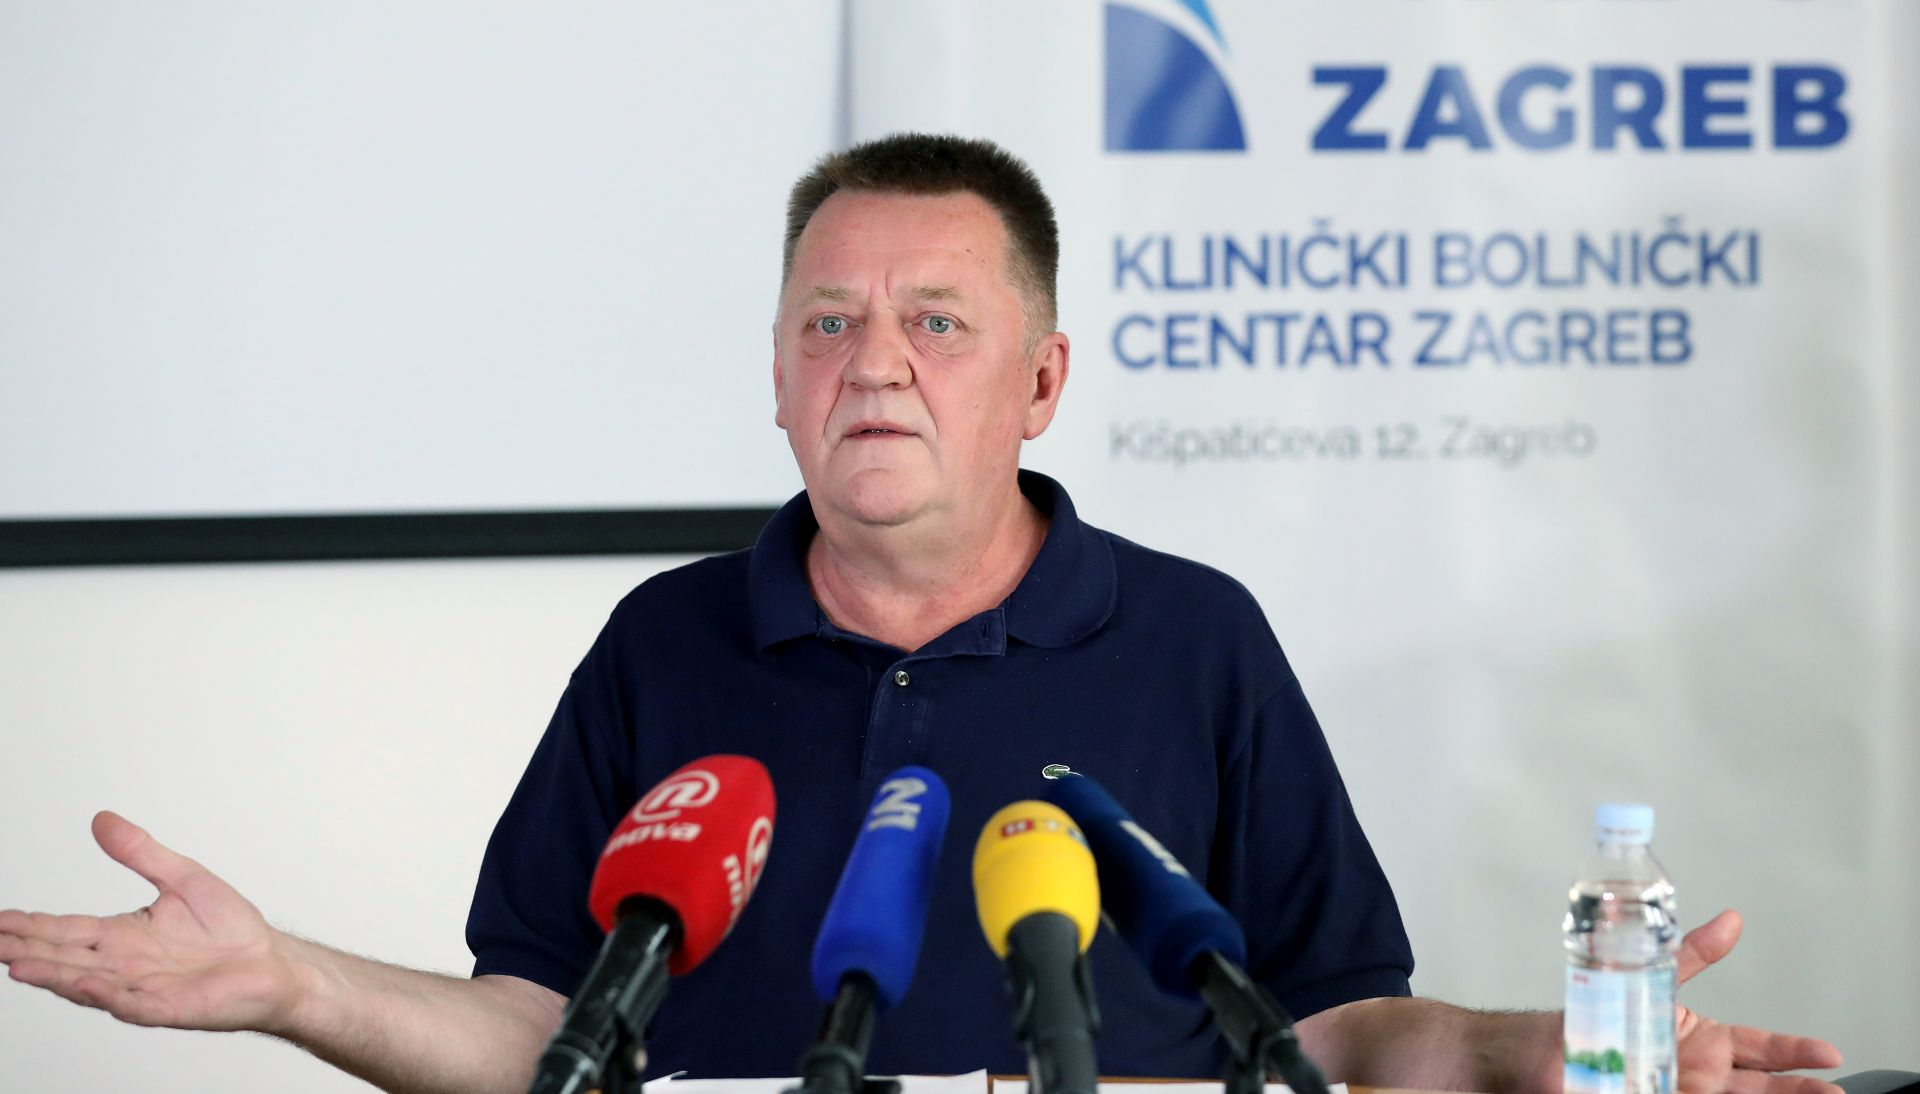 Pomoćnik ravnatelja KBC-a Zagreb: 'Izgubili smo 403 bolnička kreveta. Pacijenti su se morali stisnuti…'